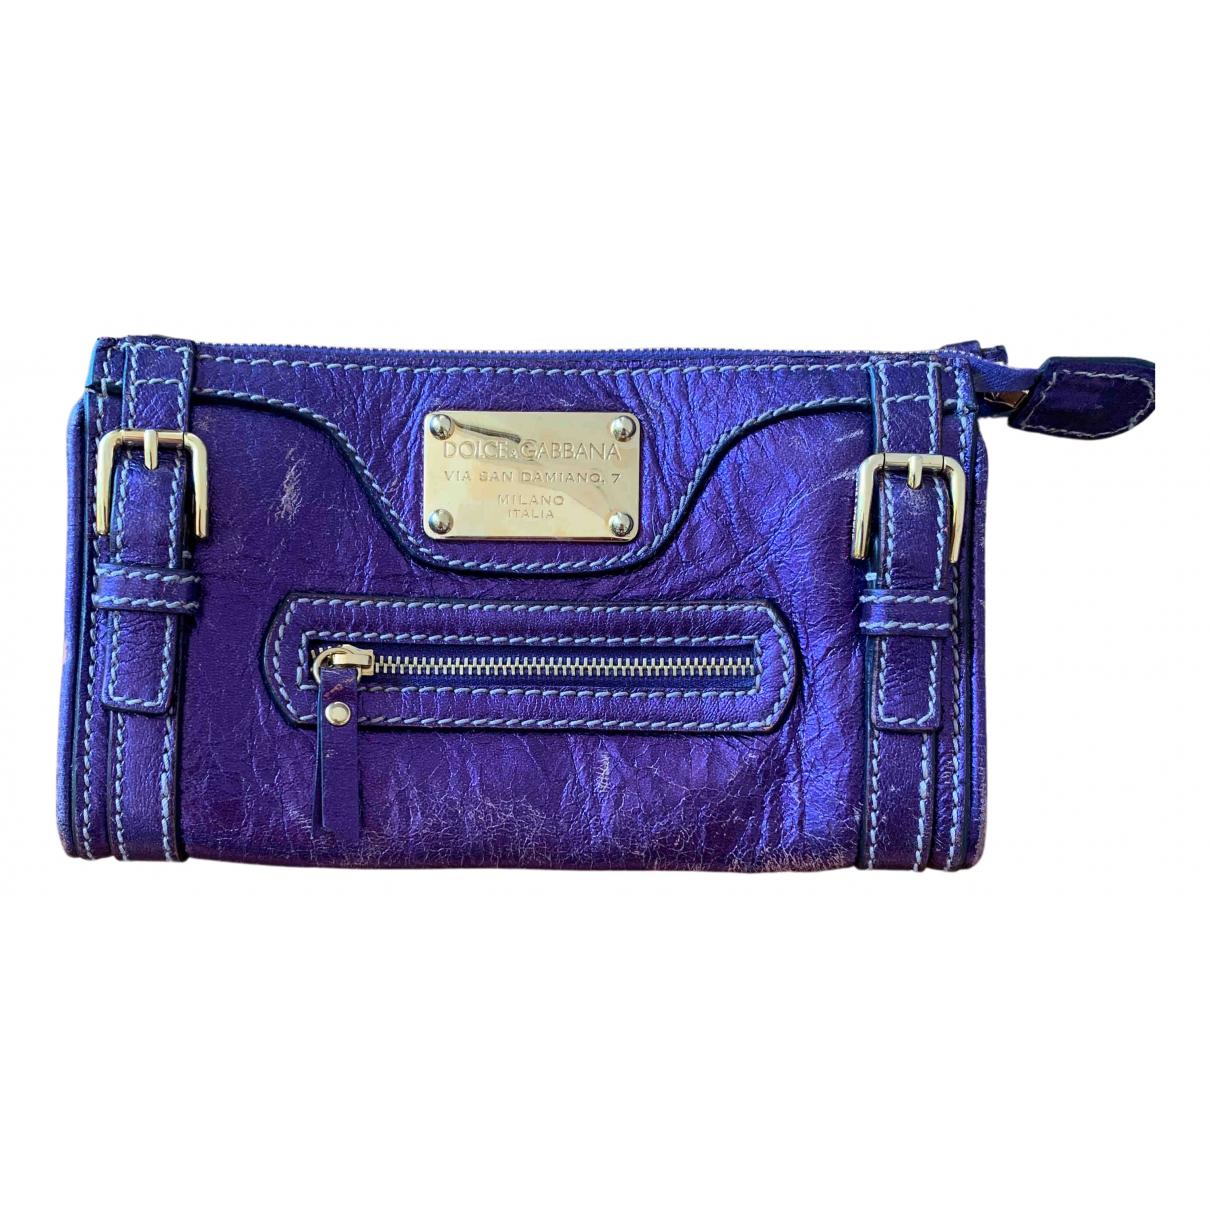 Dolce & Gabbana \N Clutch in  Blau Leder